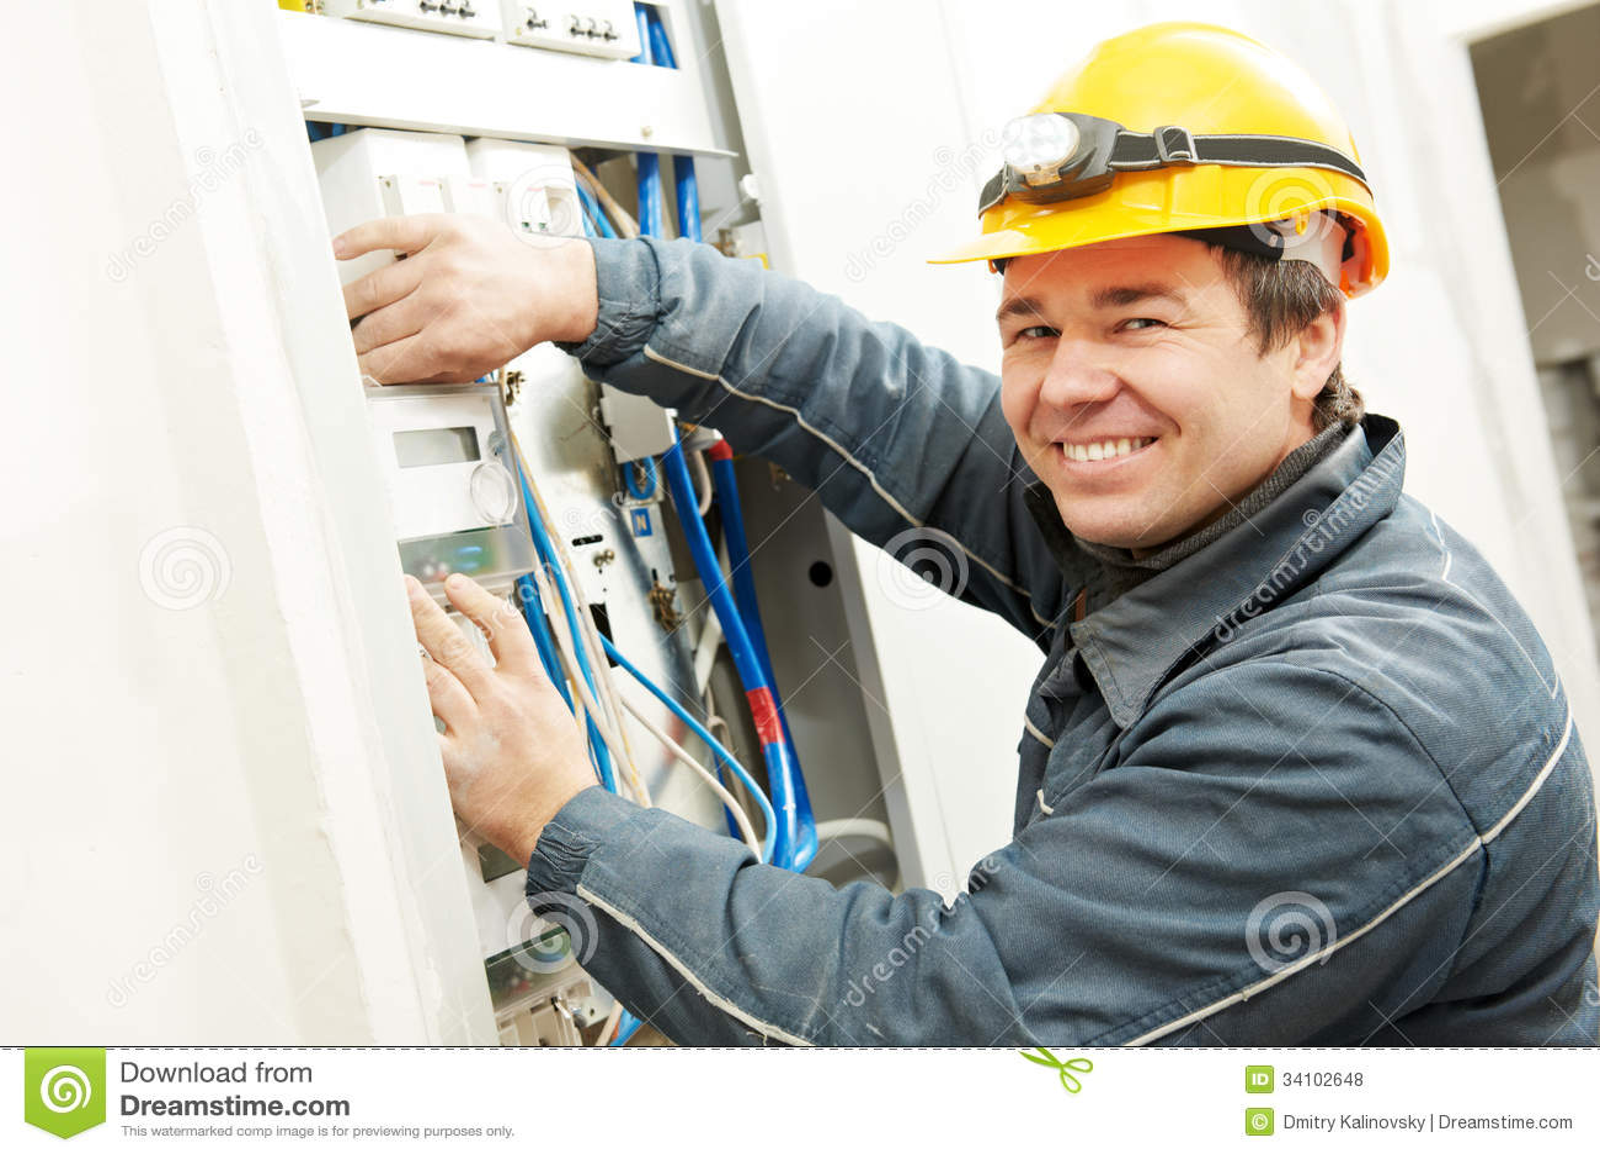 Electrician Installing Energy Saving Meter Royalty Free Stock Photos ...